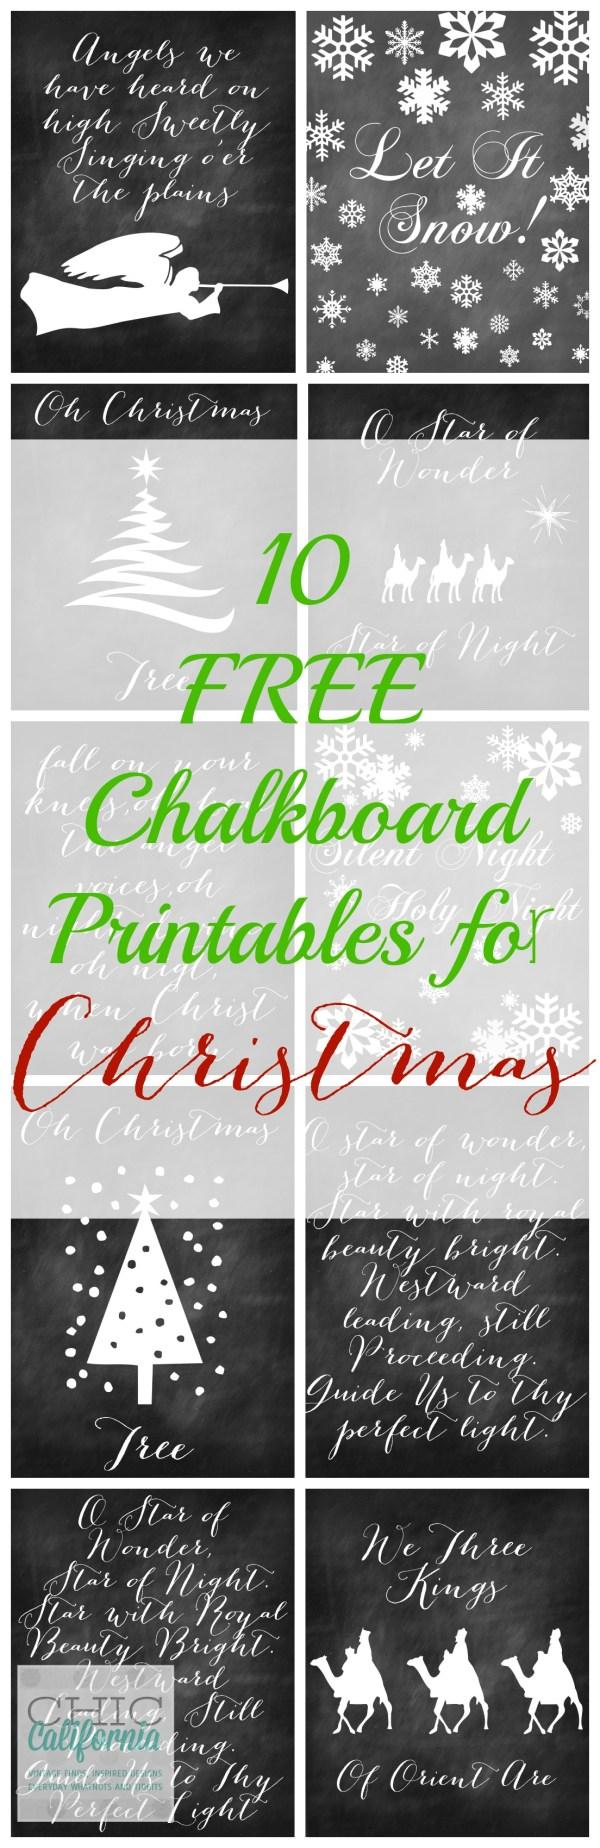 10 Free Chalkboard Printables for Chrismtas